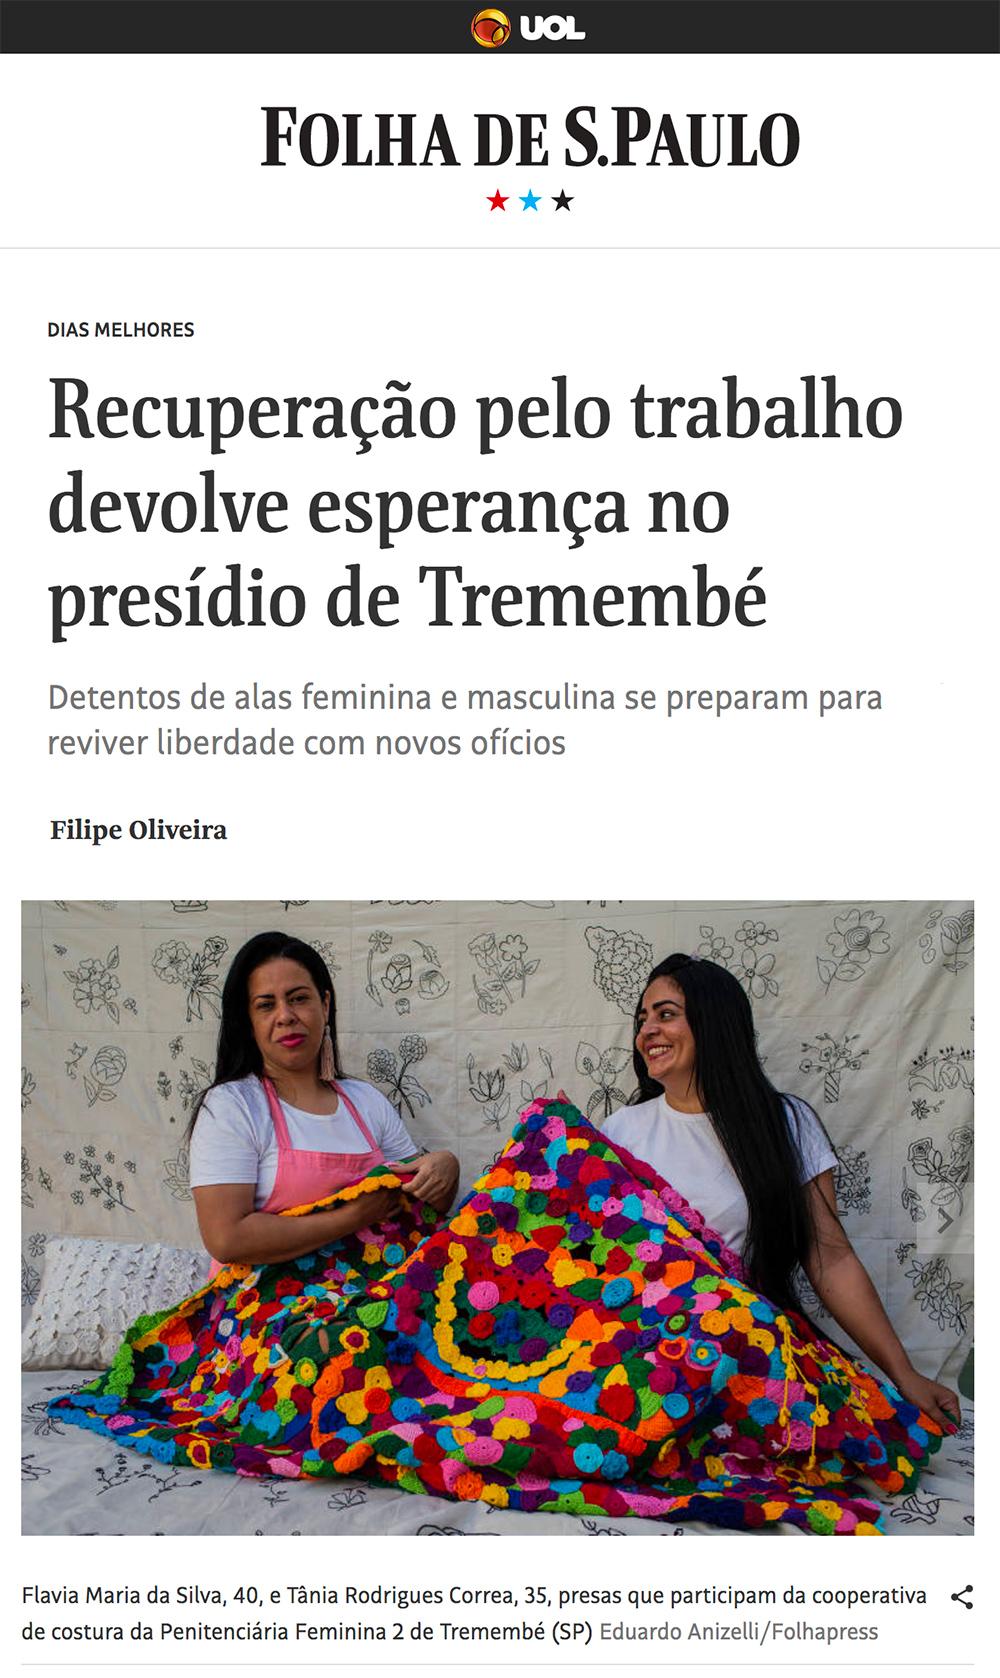 Folha-de-S.-Paulo.jpeg